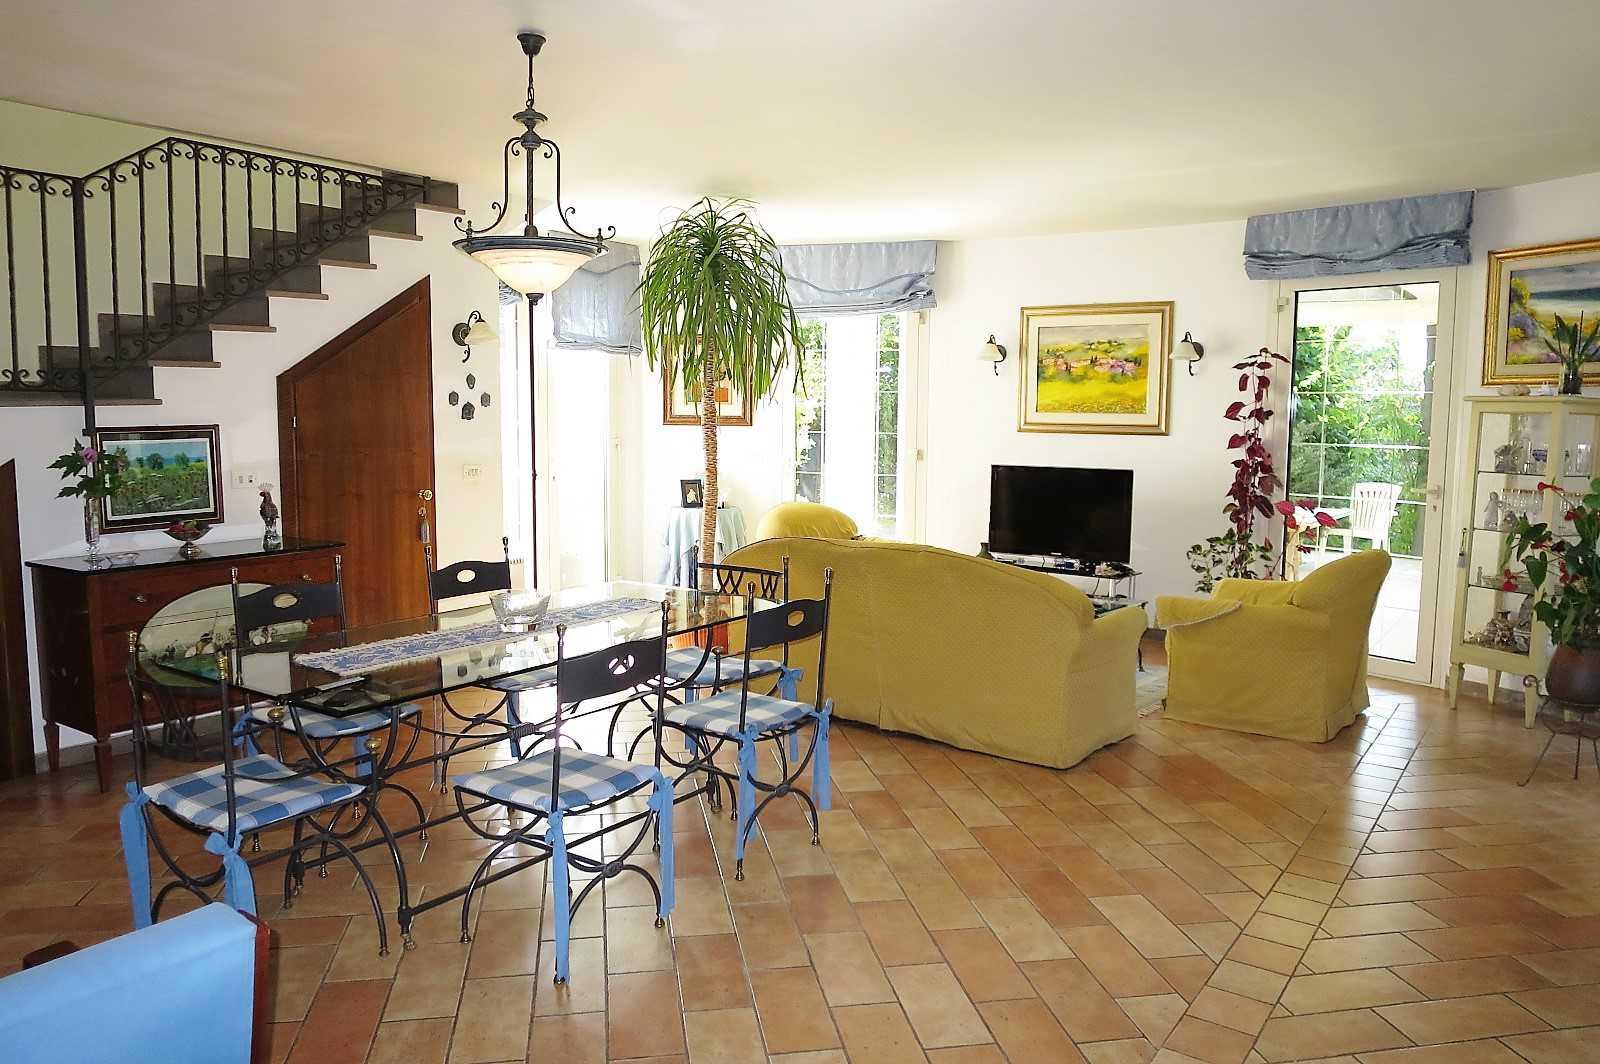 Villa Villa in vendita Atri (TE), Villa Paola - Atri - EUR 471.071 110